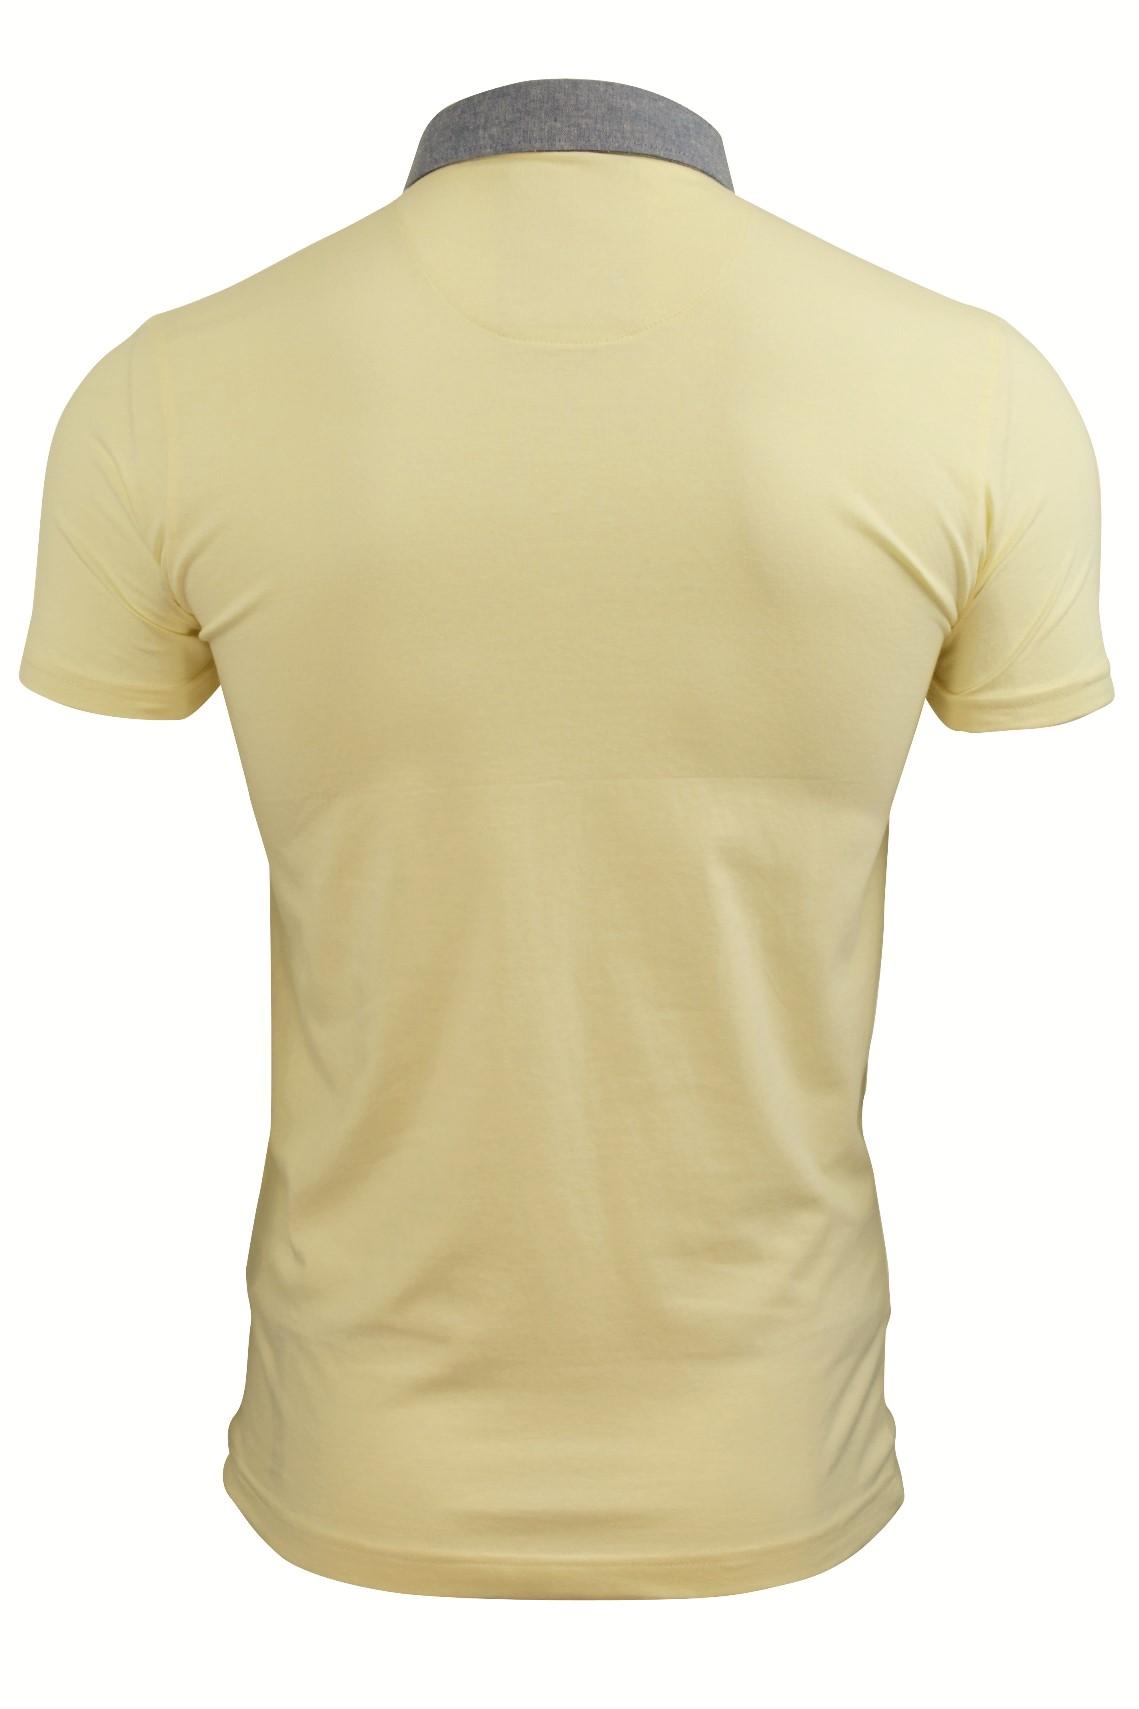 Mens-Polo-T-Shirt-Chimera-Brave-Soul-Denim-Chambray-Collar-Short-Sleeved-Cotton thumbnail 18